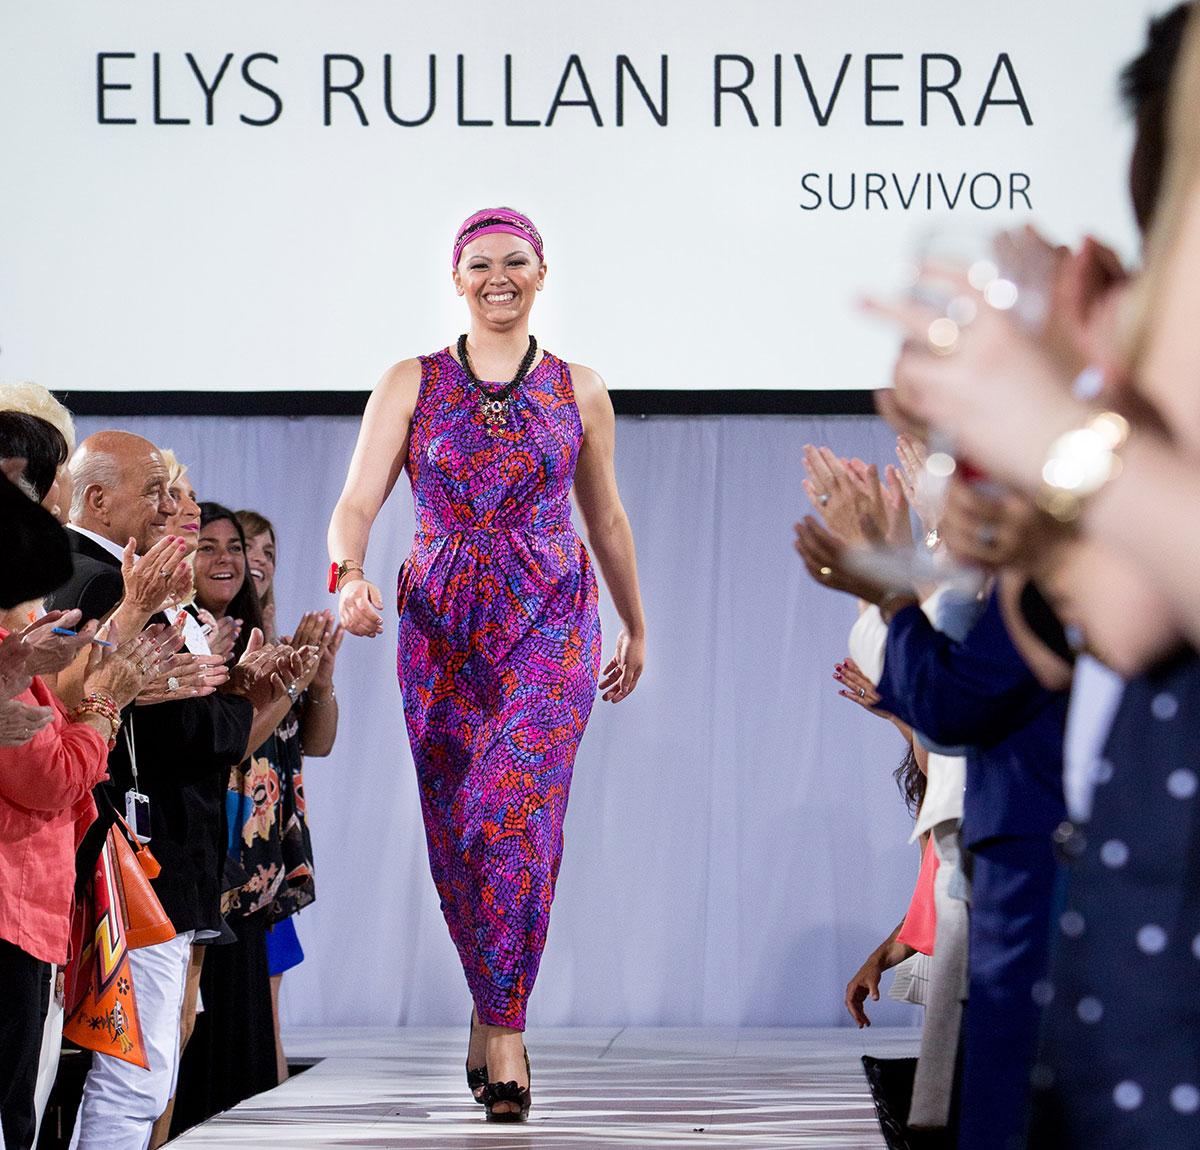 elys walks the runway. photo by fournier & malloy photographers